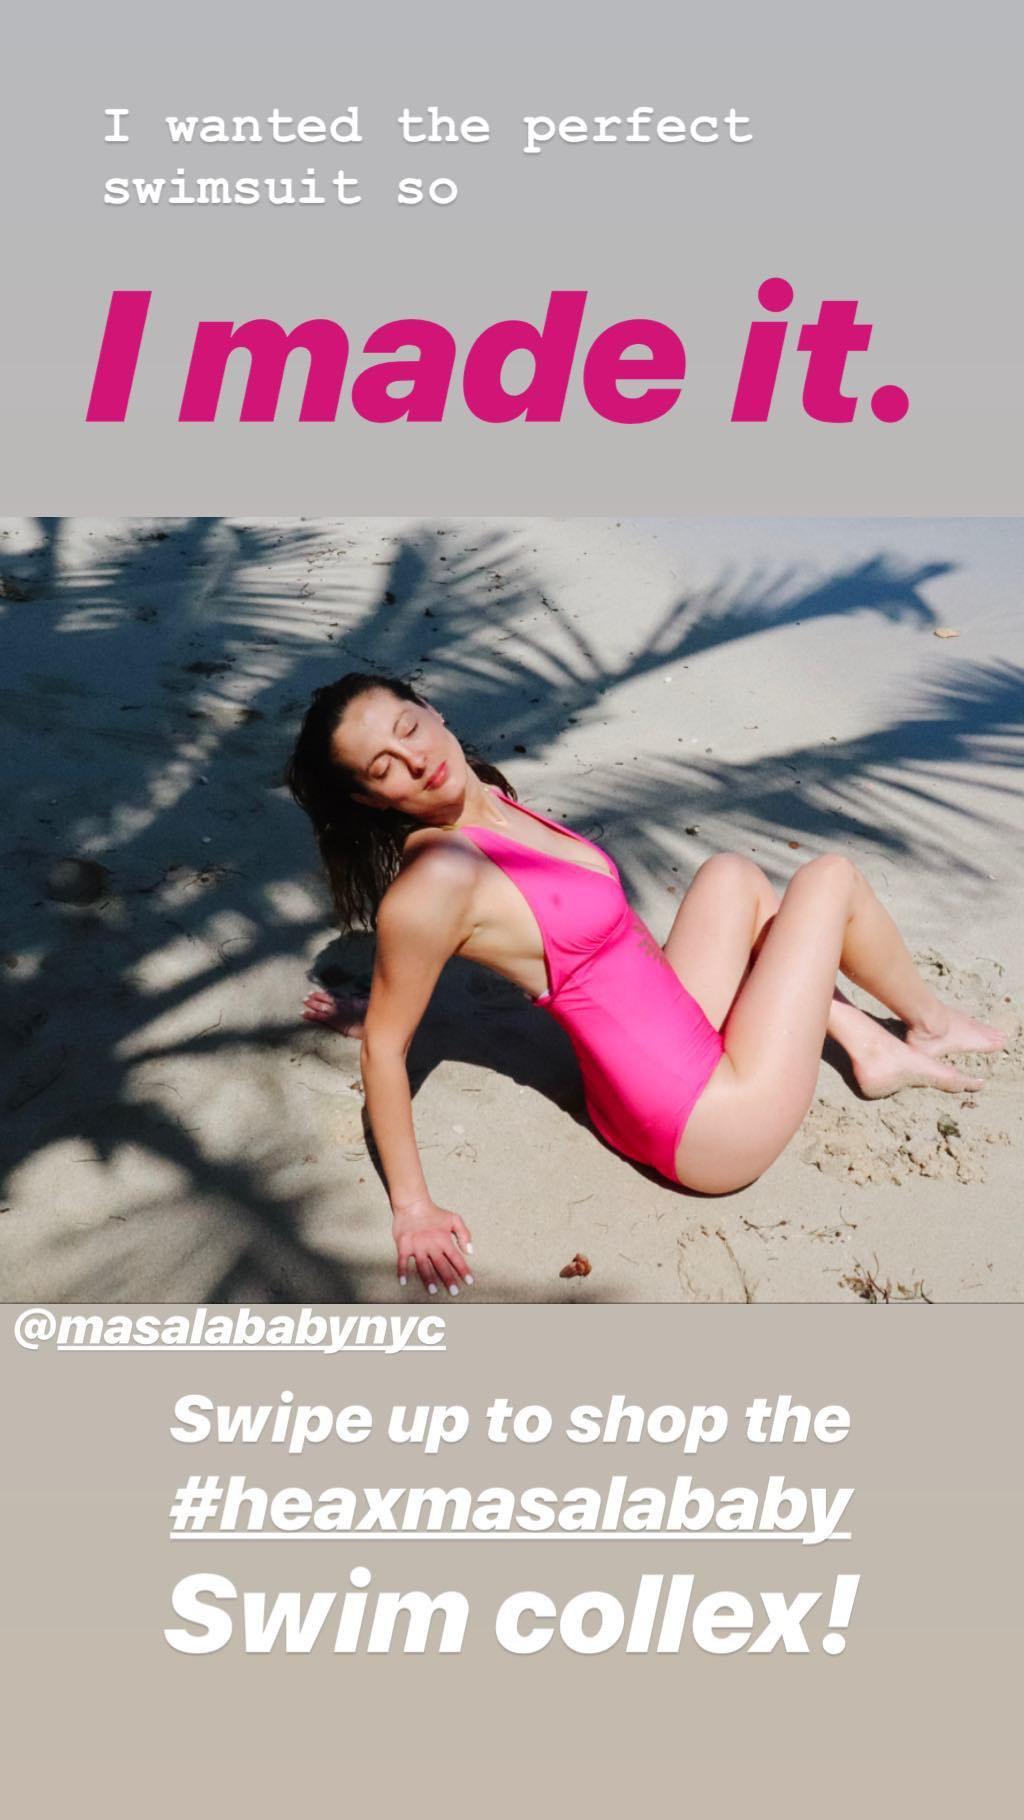 Eva Amurri Martino Big Boobs In Pink Swimsuit